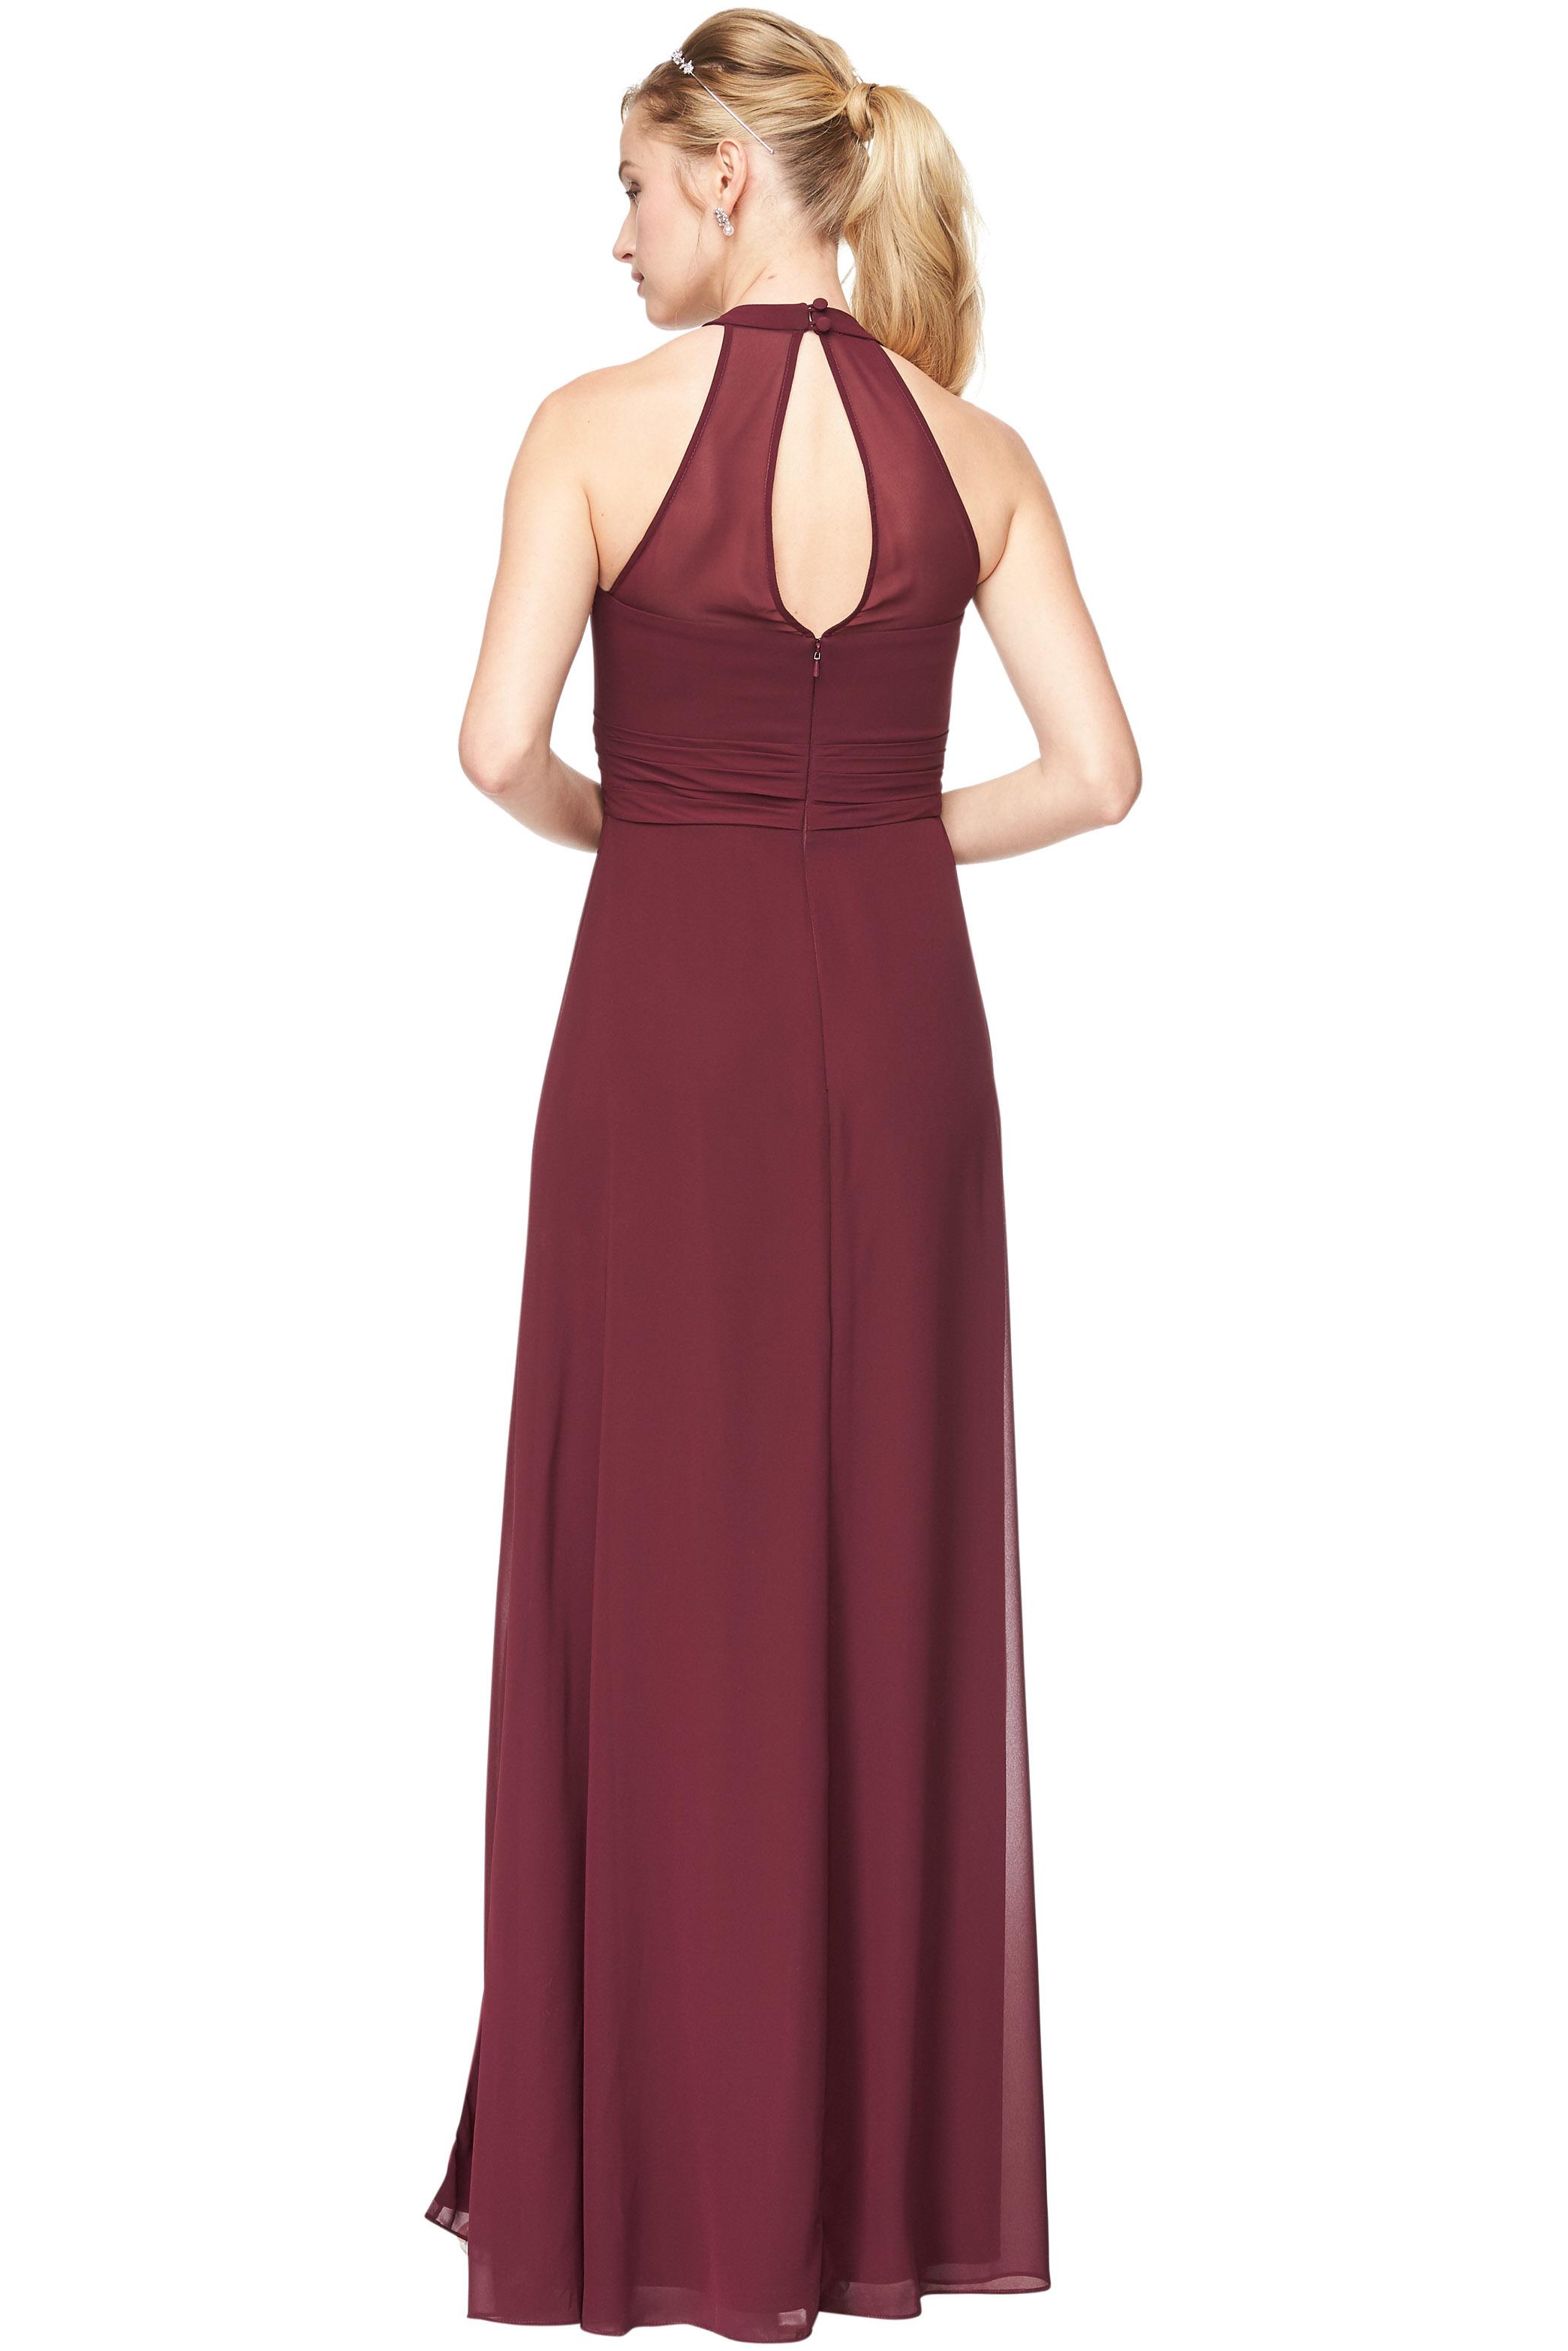 Bill Levkoff WINE Chiffon V-Neck A-Line gown, $198.00 Back